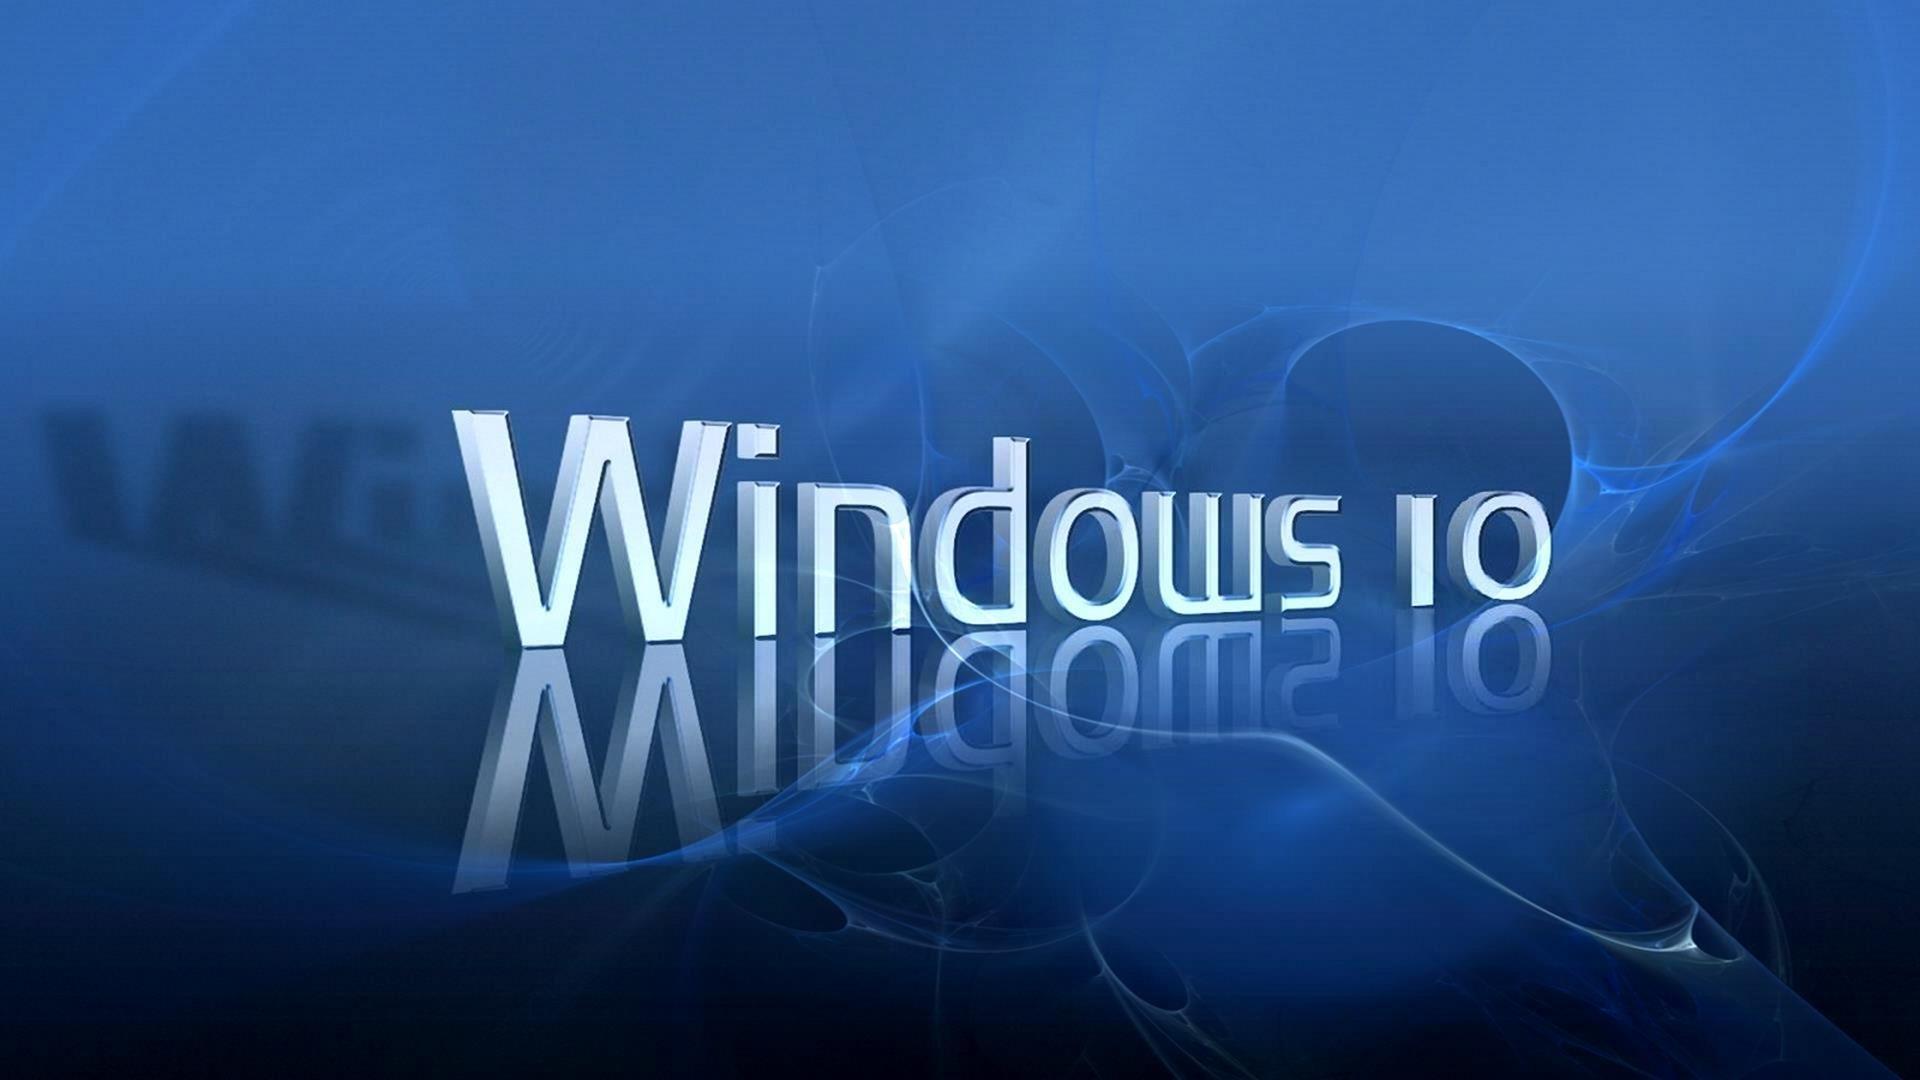 Windows 10 wallpapers 1920x1080 Full HD (1080p) desktop ...